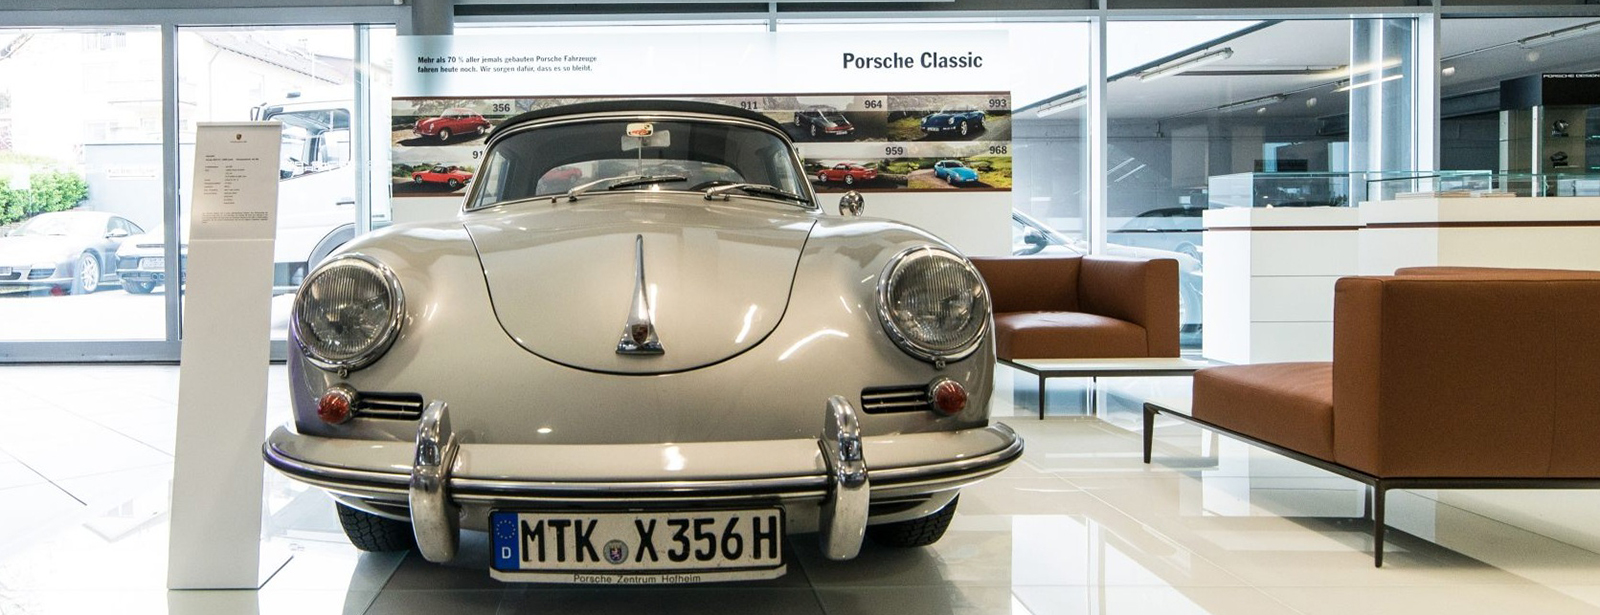 Porsche Classic Partner | Willkommen